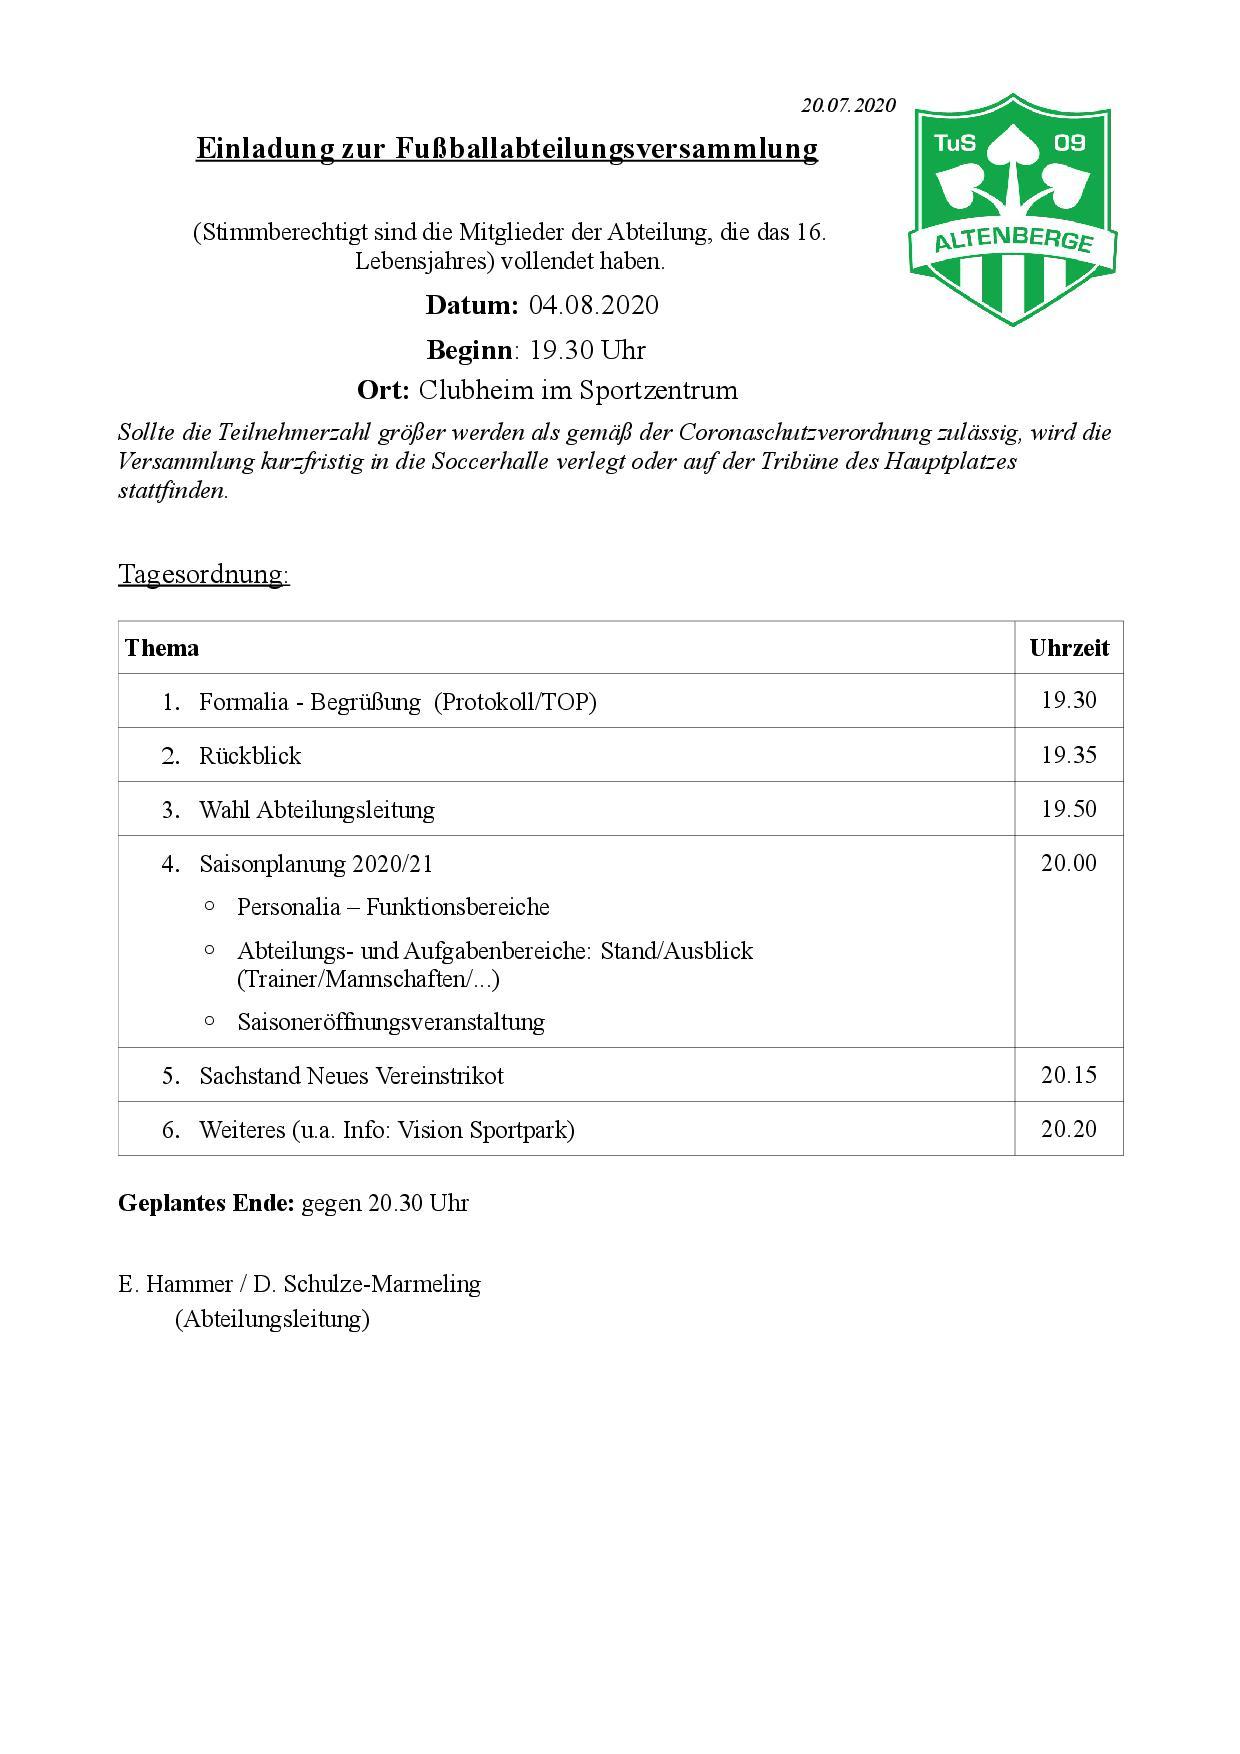 Fußballabteilungsversammlung am 04.08.2020